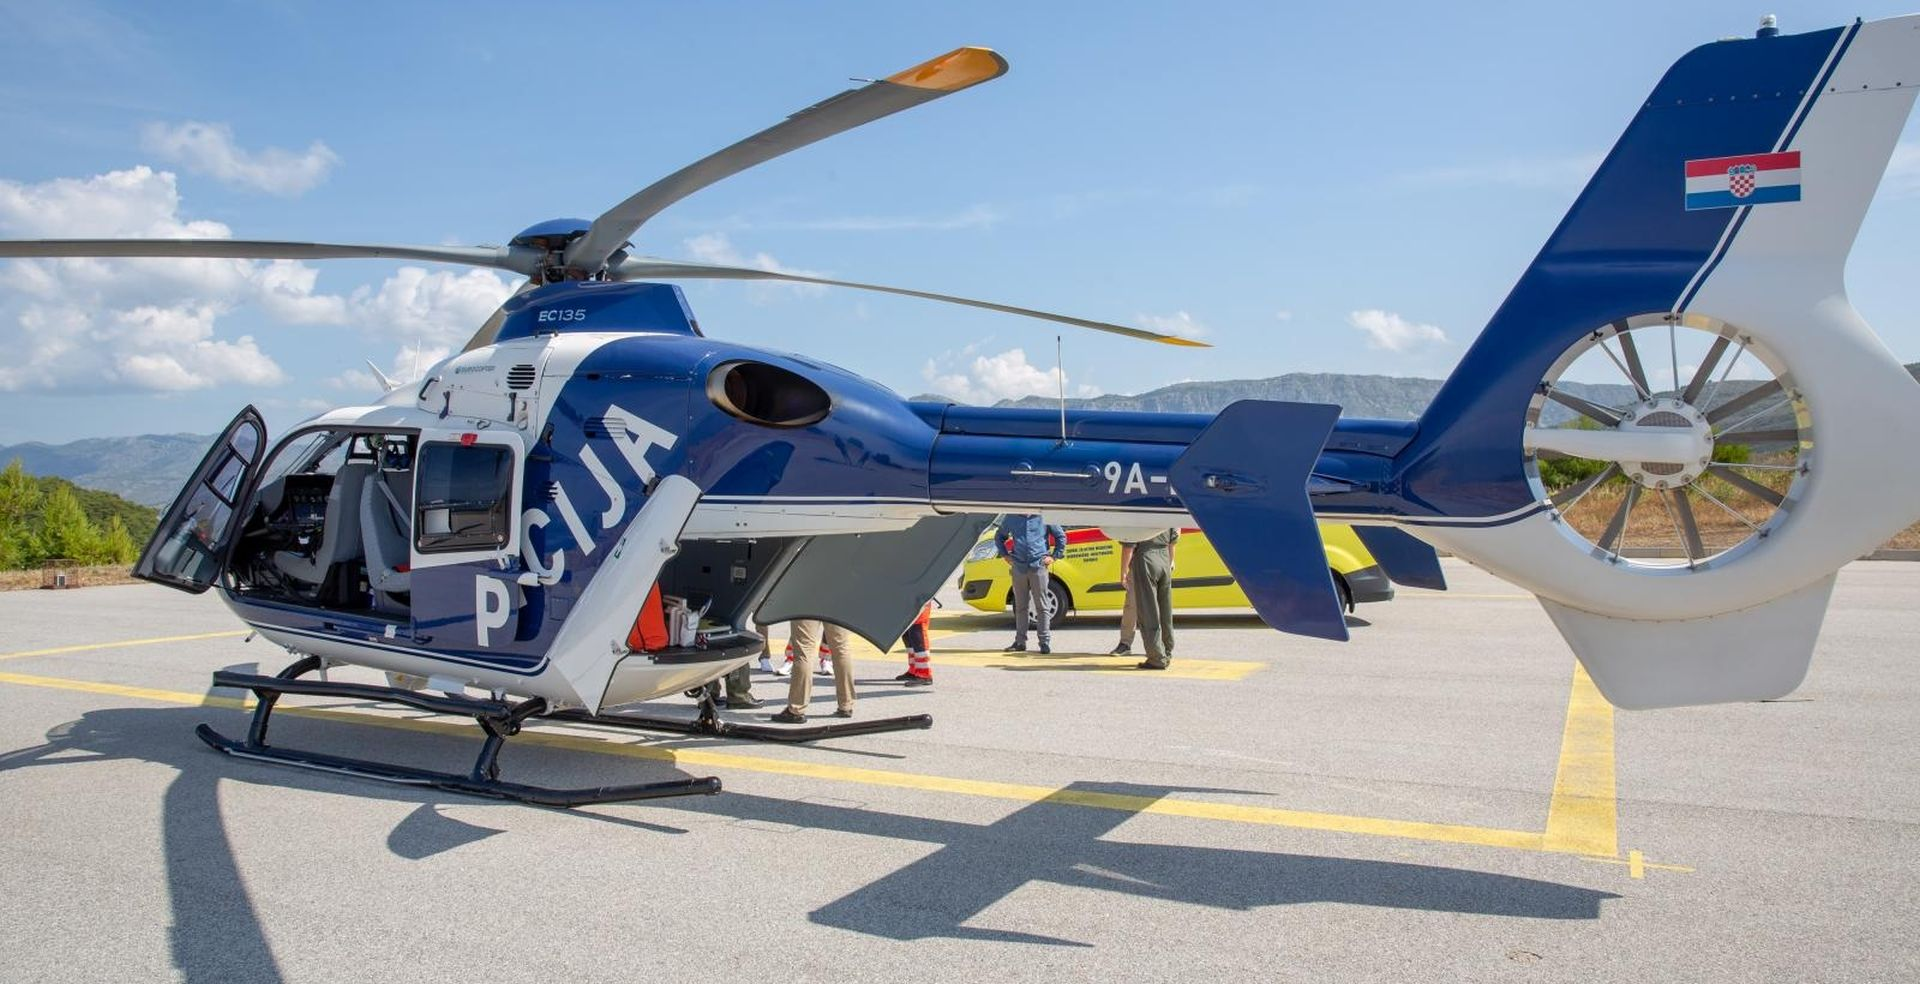 Dijete ugrizao poskok, helikopterom hitno prebačeno u Split